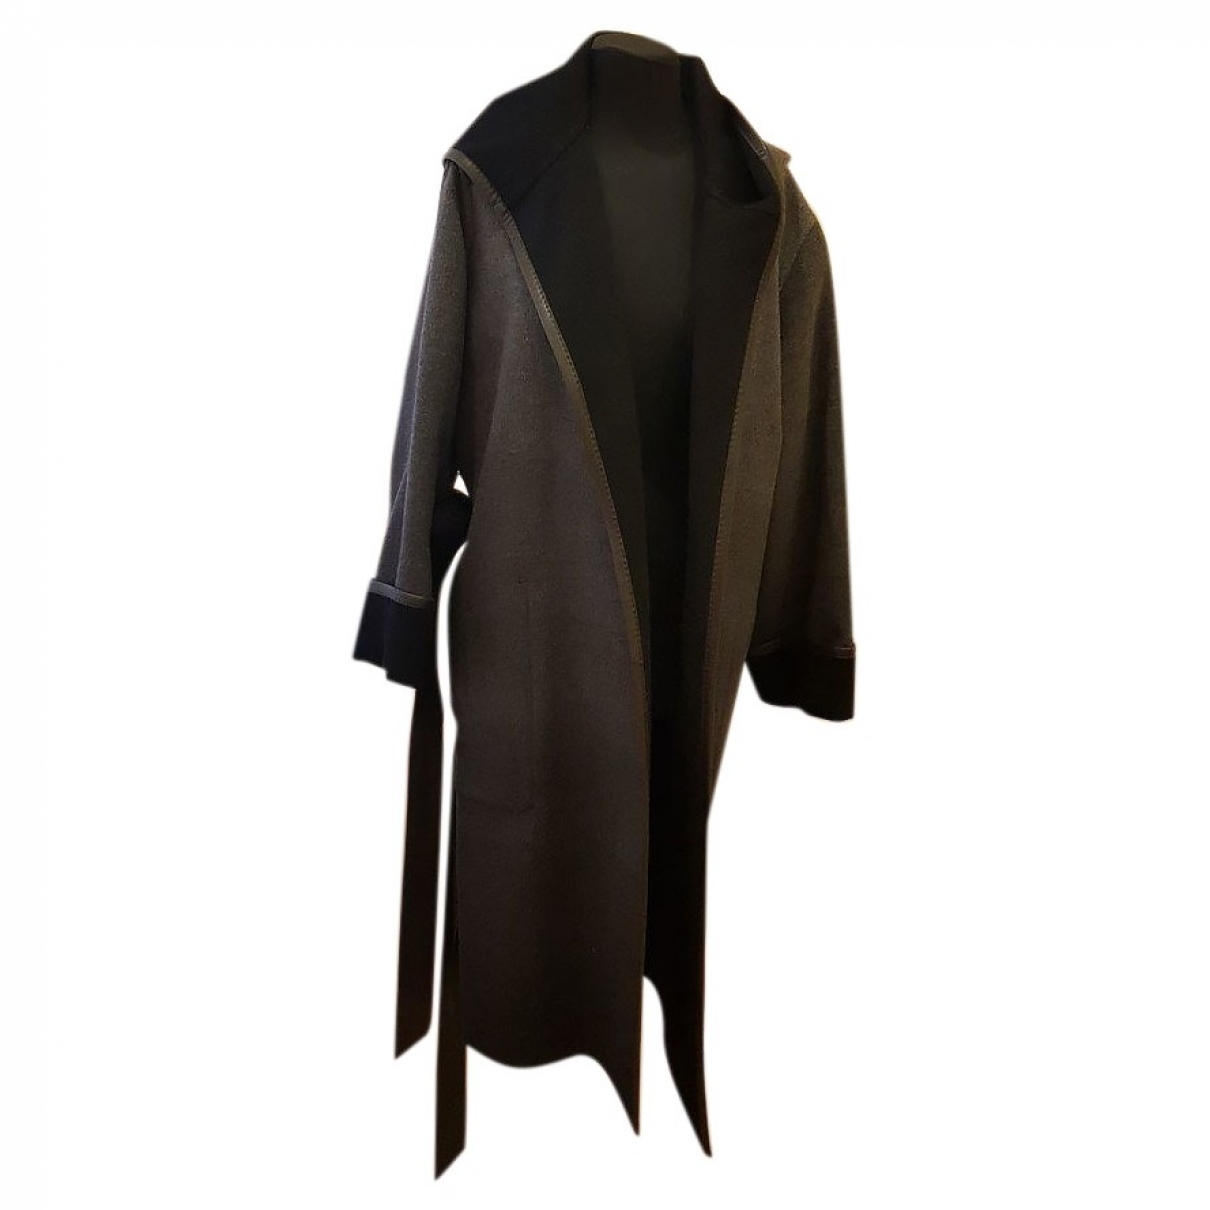 Hermès \N Grey Cashmere coat for Women 36 FR